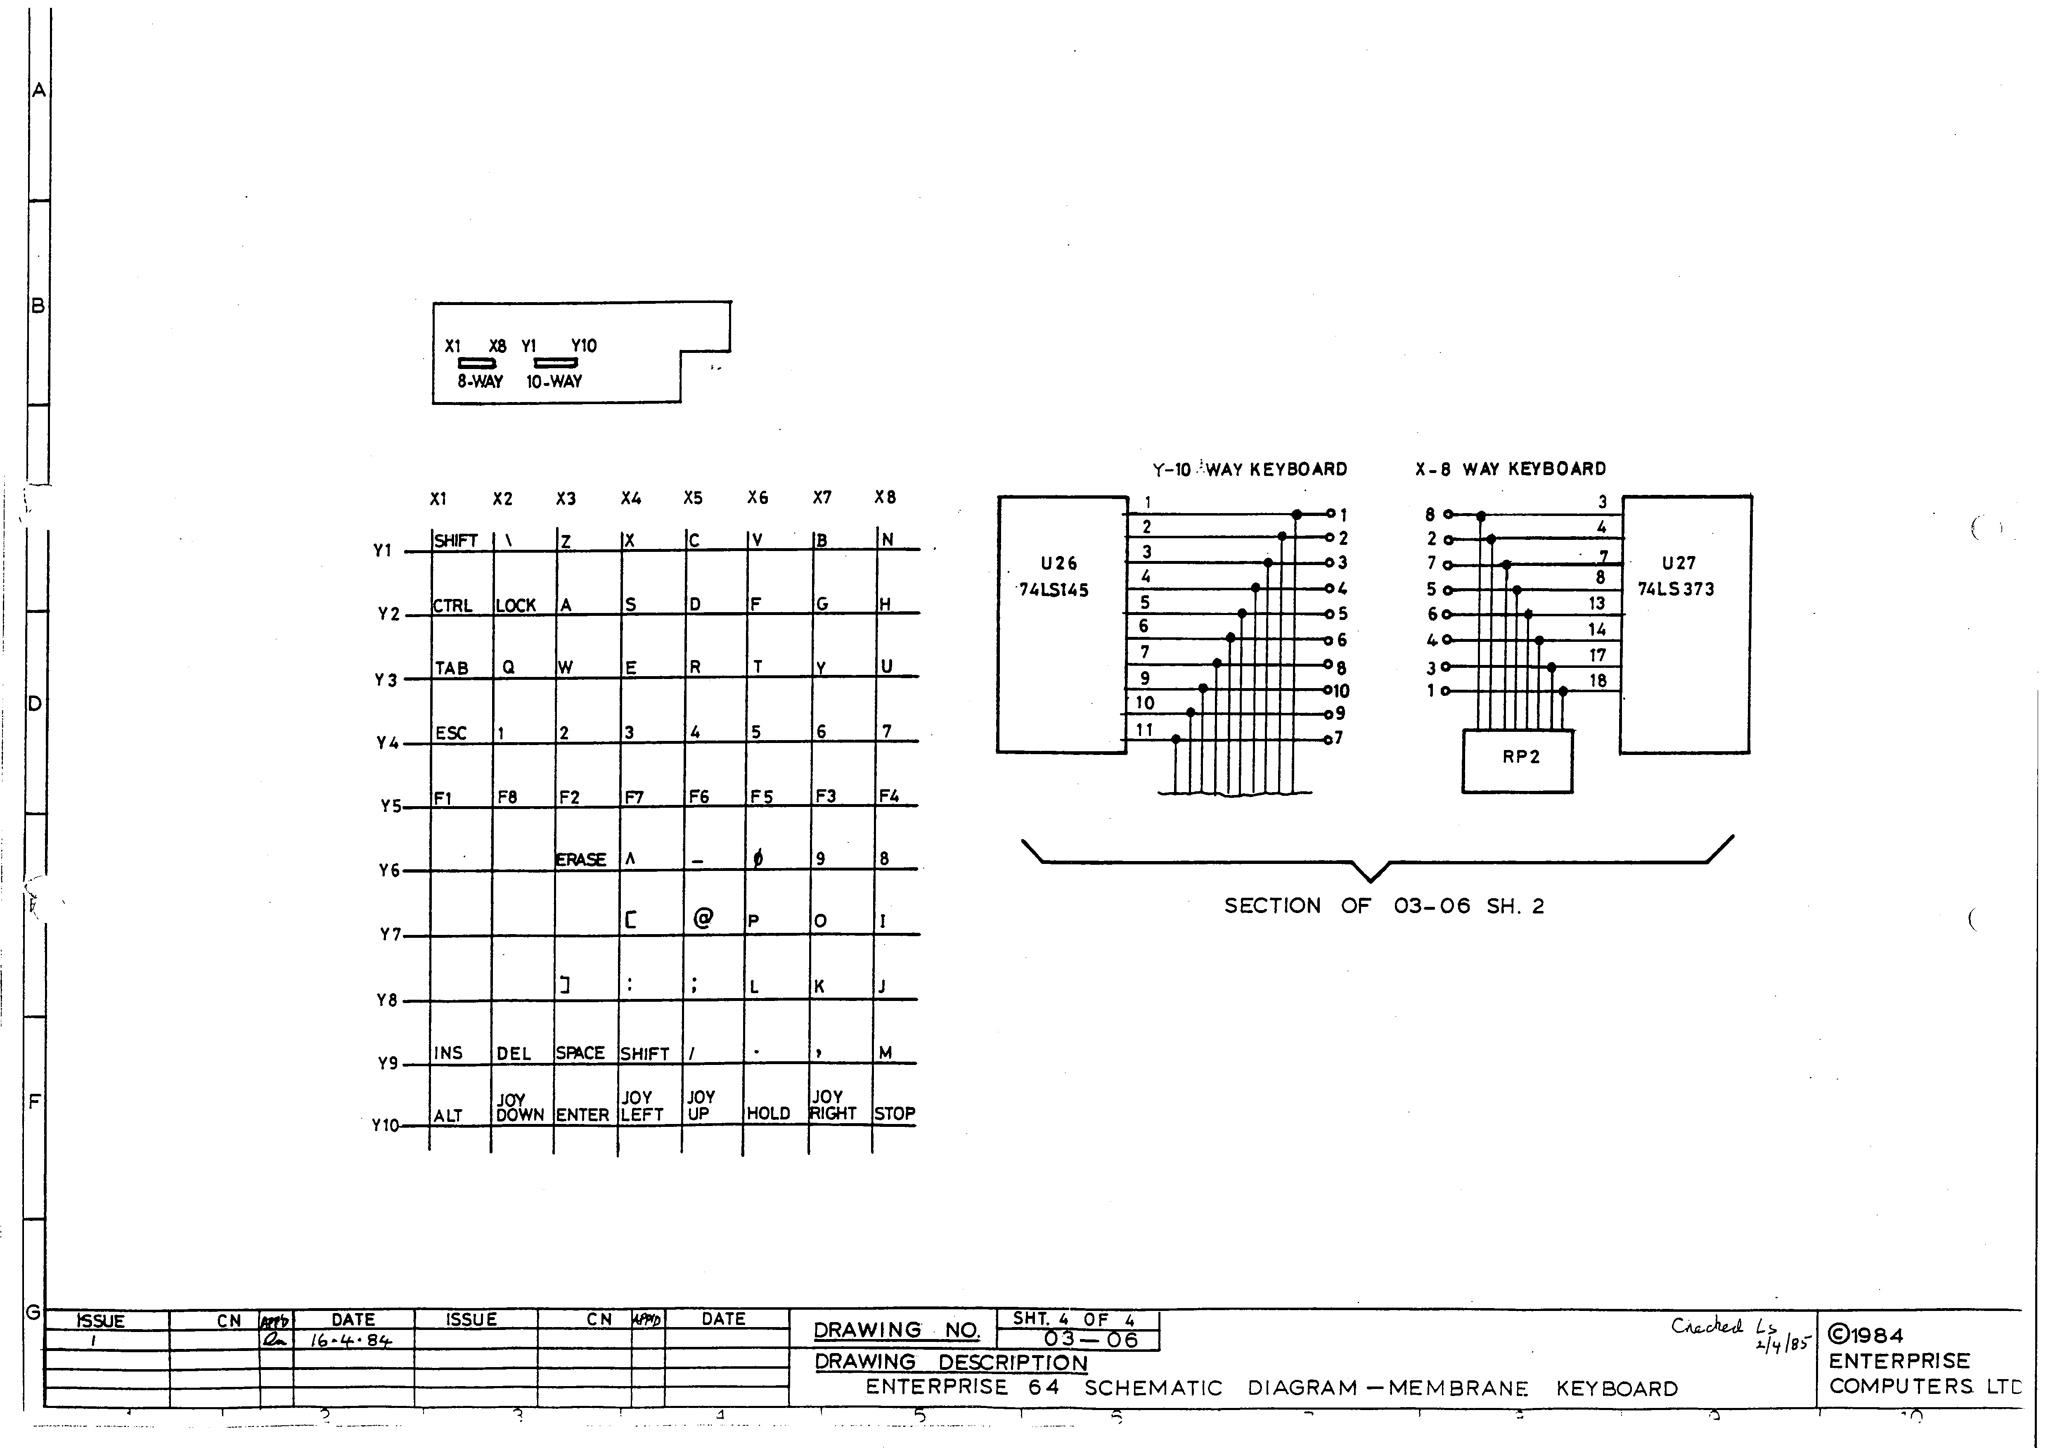 Schön 74 Rd 200 Schaltplan Ideen - Der Schaltplan - greigo.com